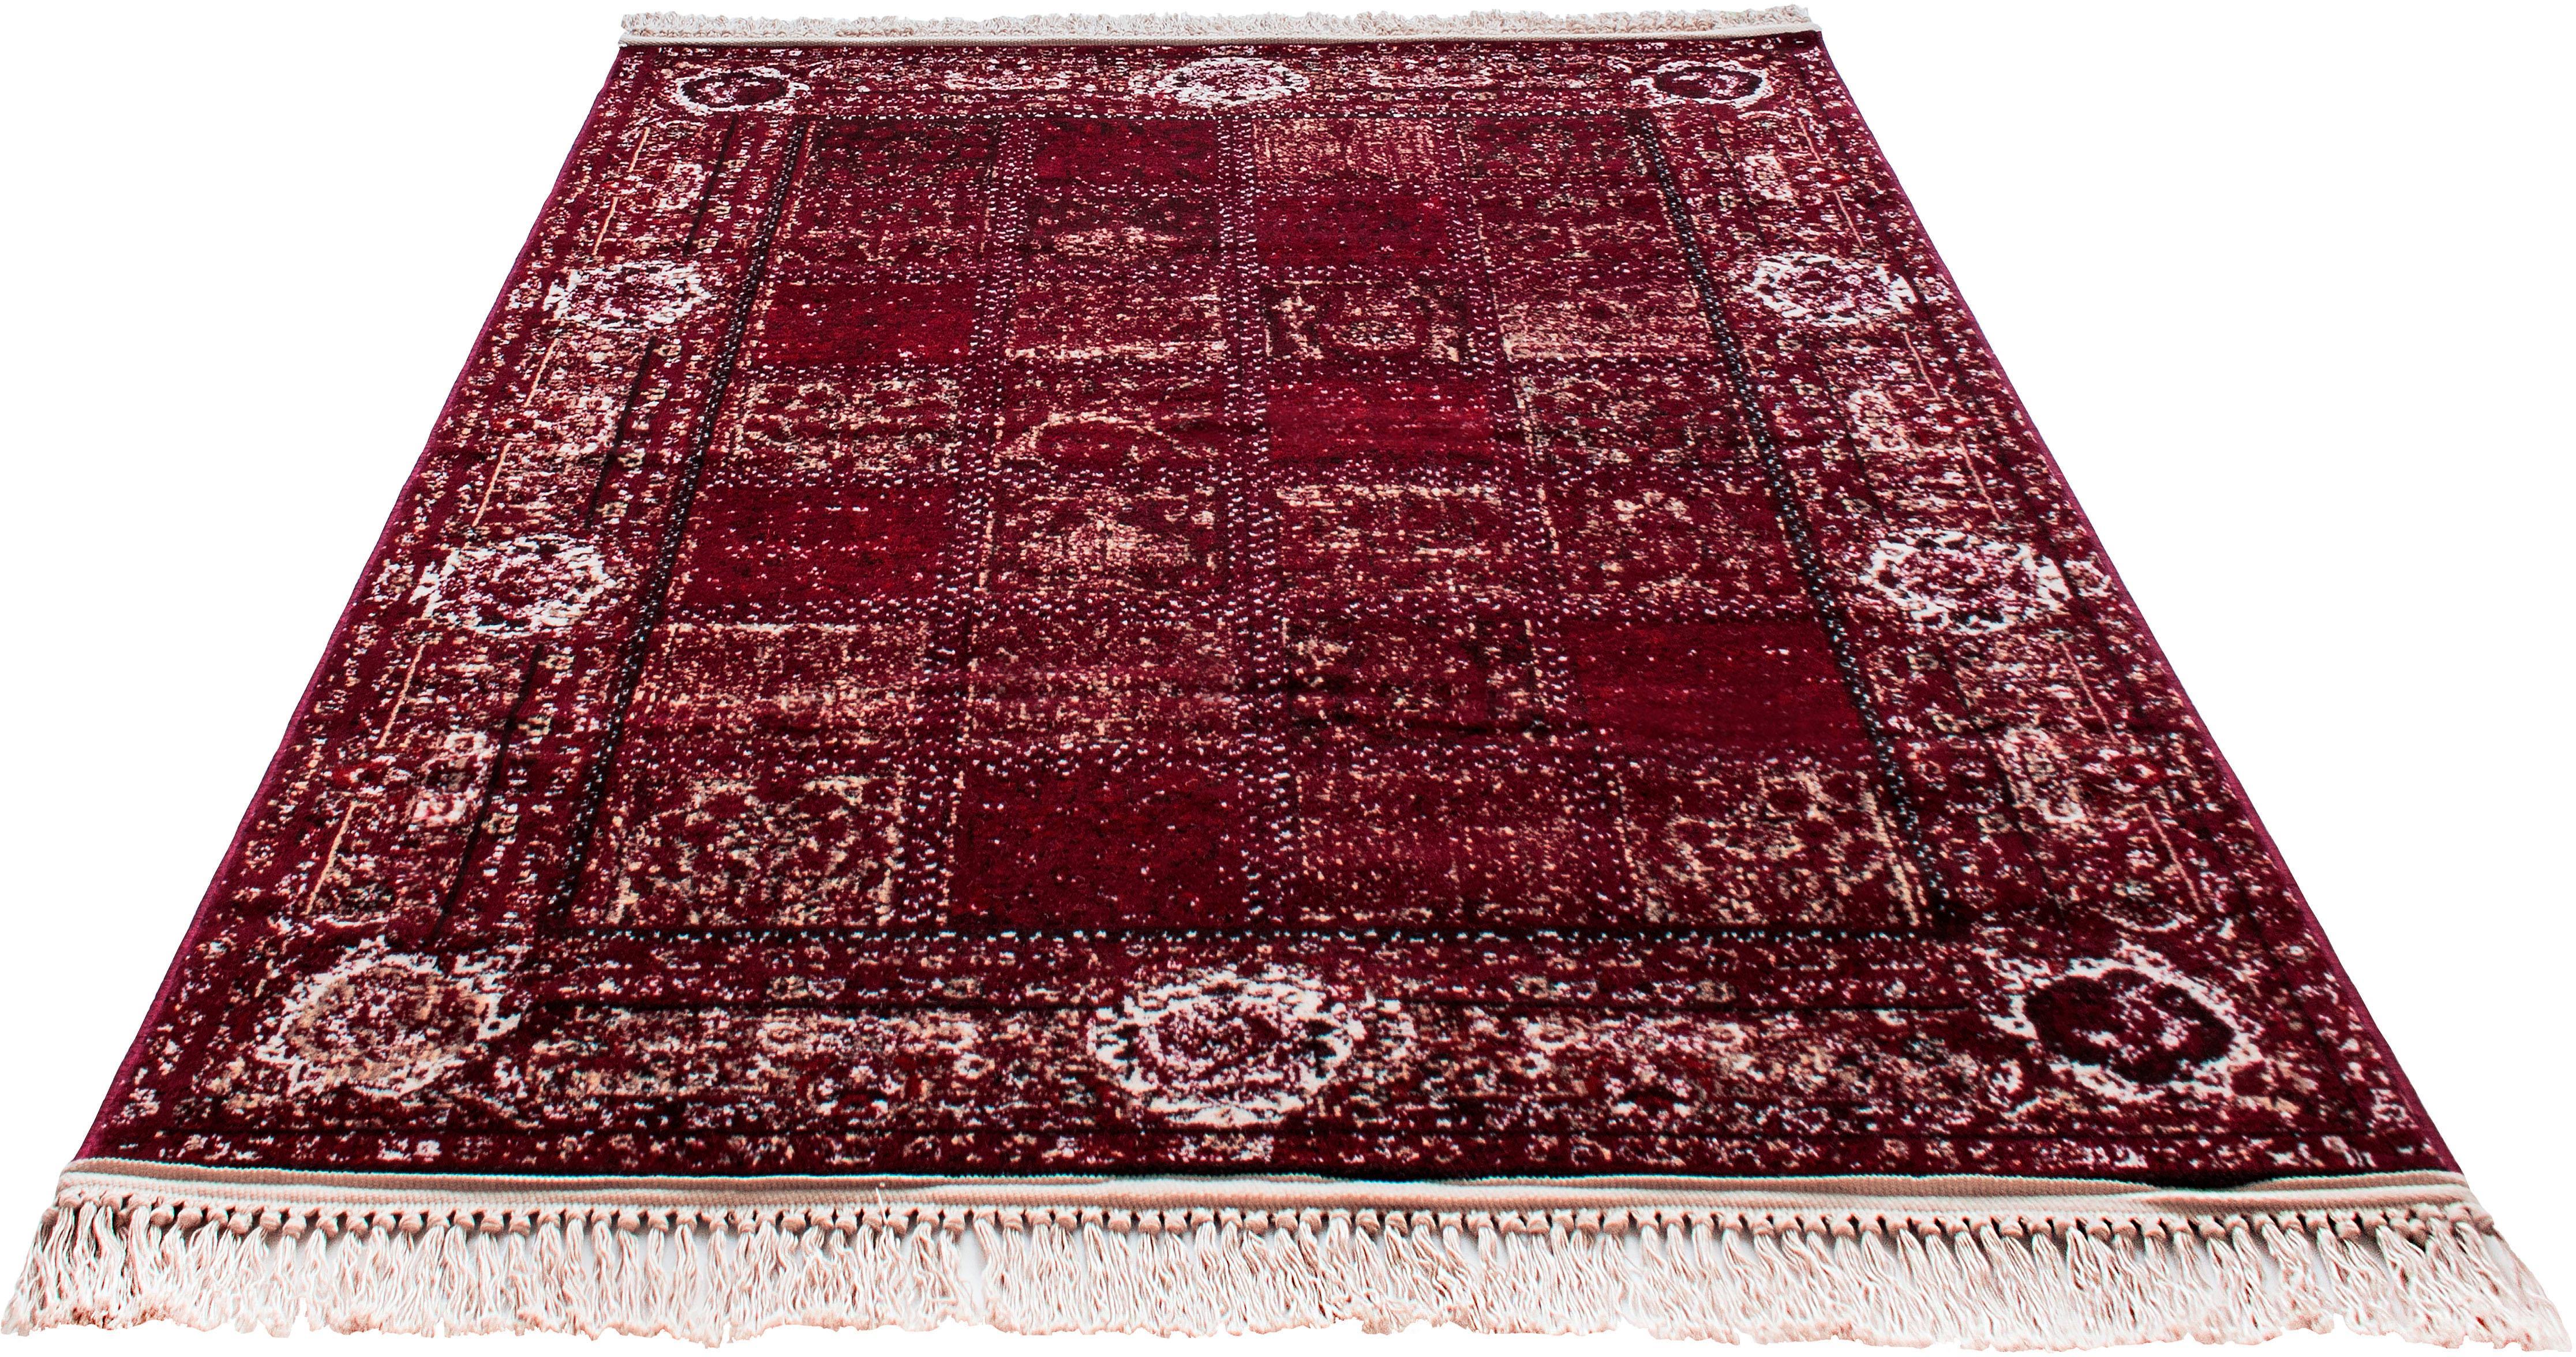 Teppich Historia 7001 Sehrazat rechteckig Höhe 11 mm maschinell gewebt